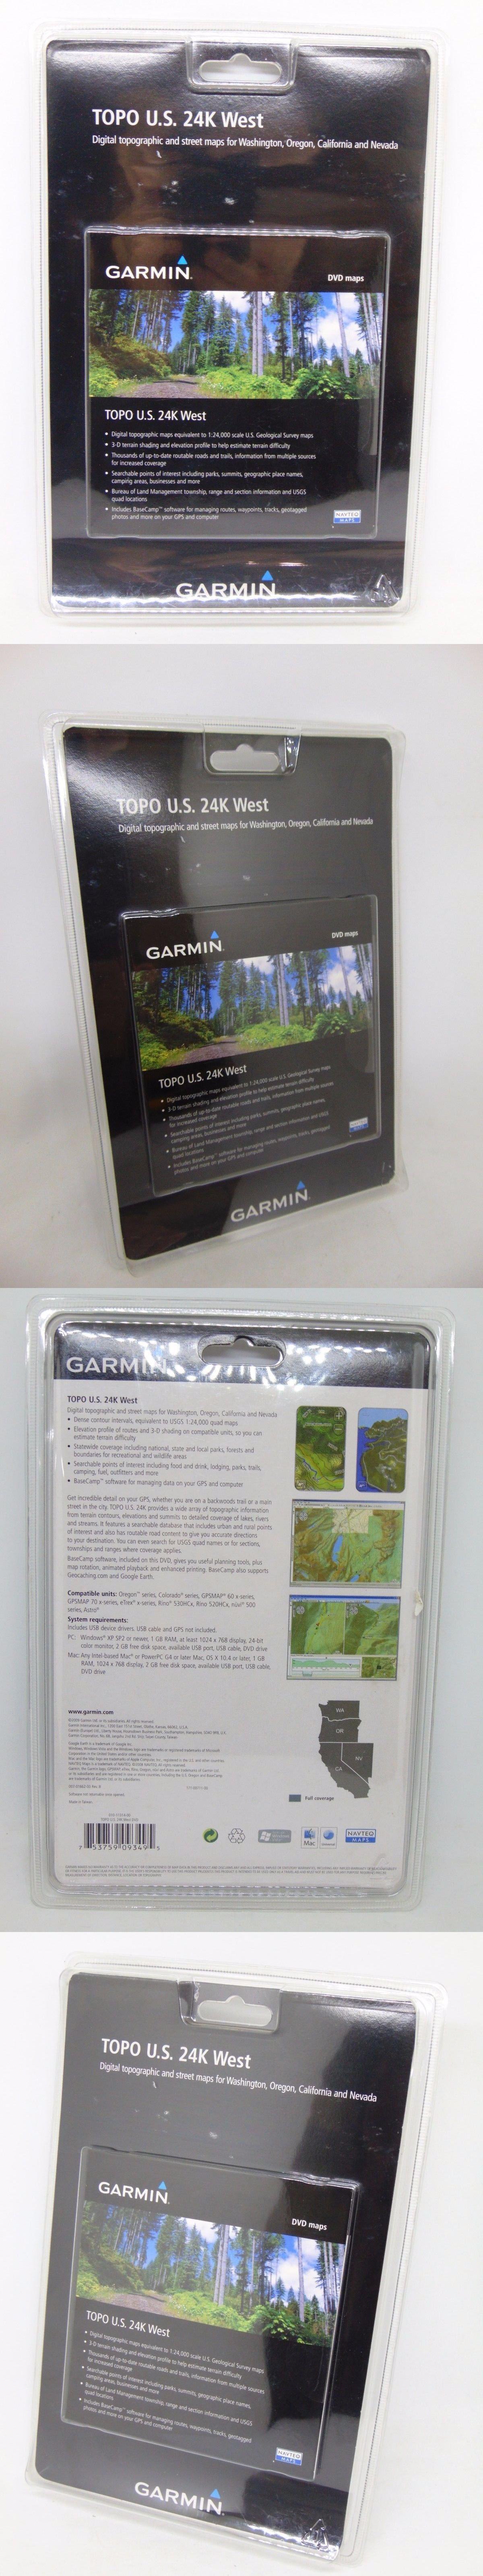 GPS Software And Maps Garmin Topo US 24K West Digital - Buy Us Topo24k Garmin Maps